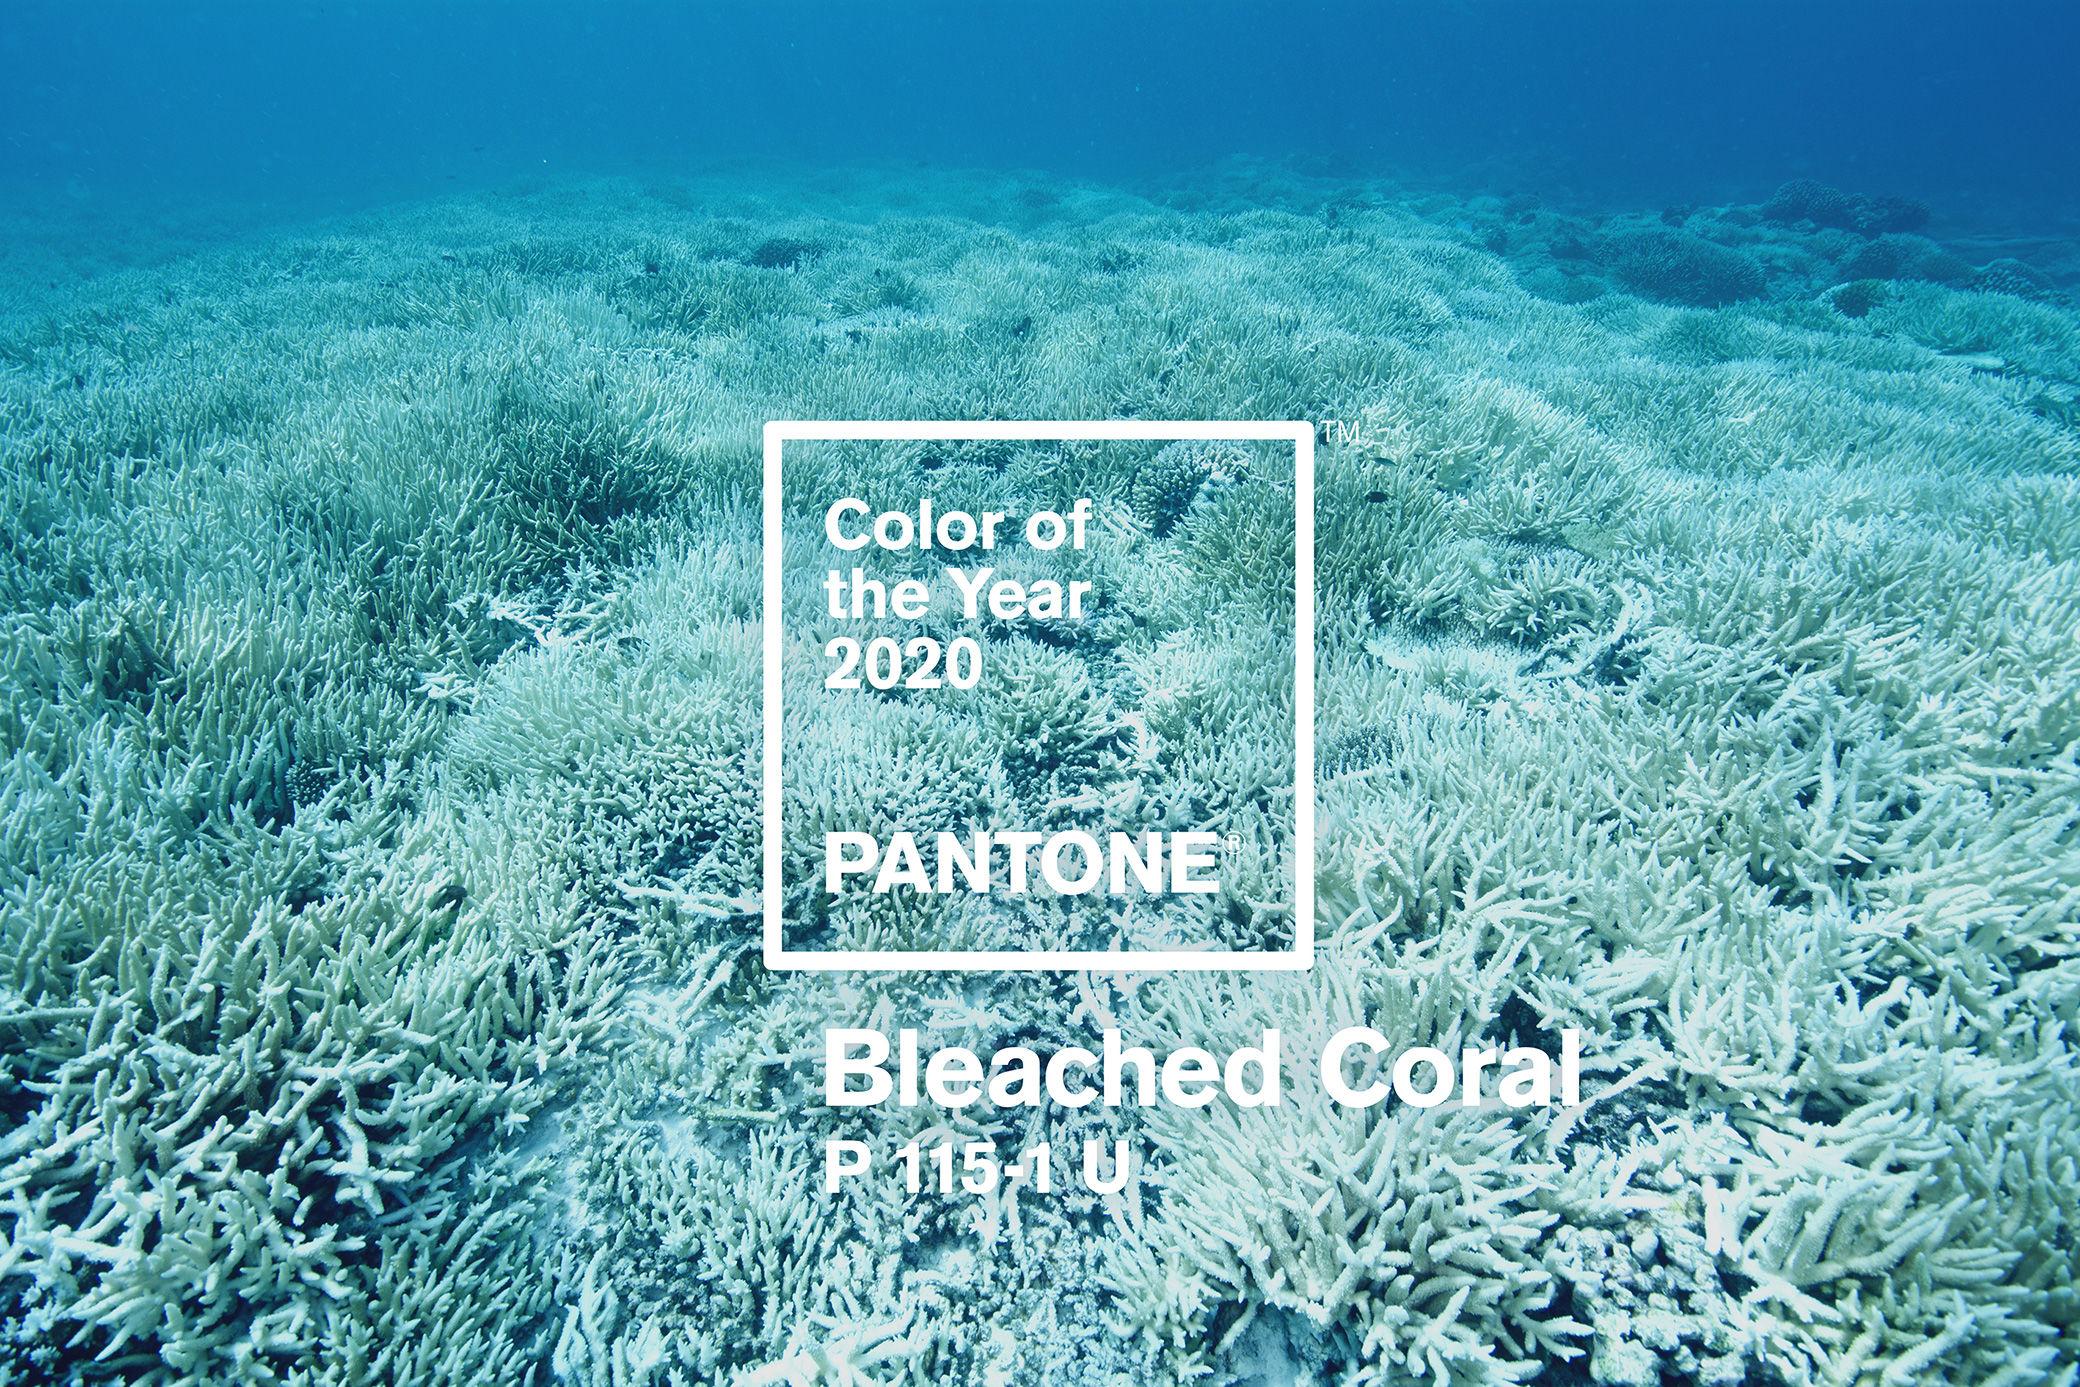 jack-huei pantone 2020 bleached coral elledecoration vn